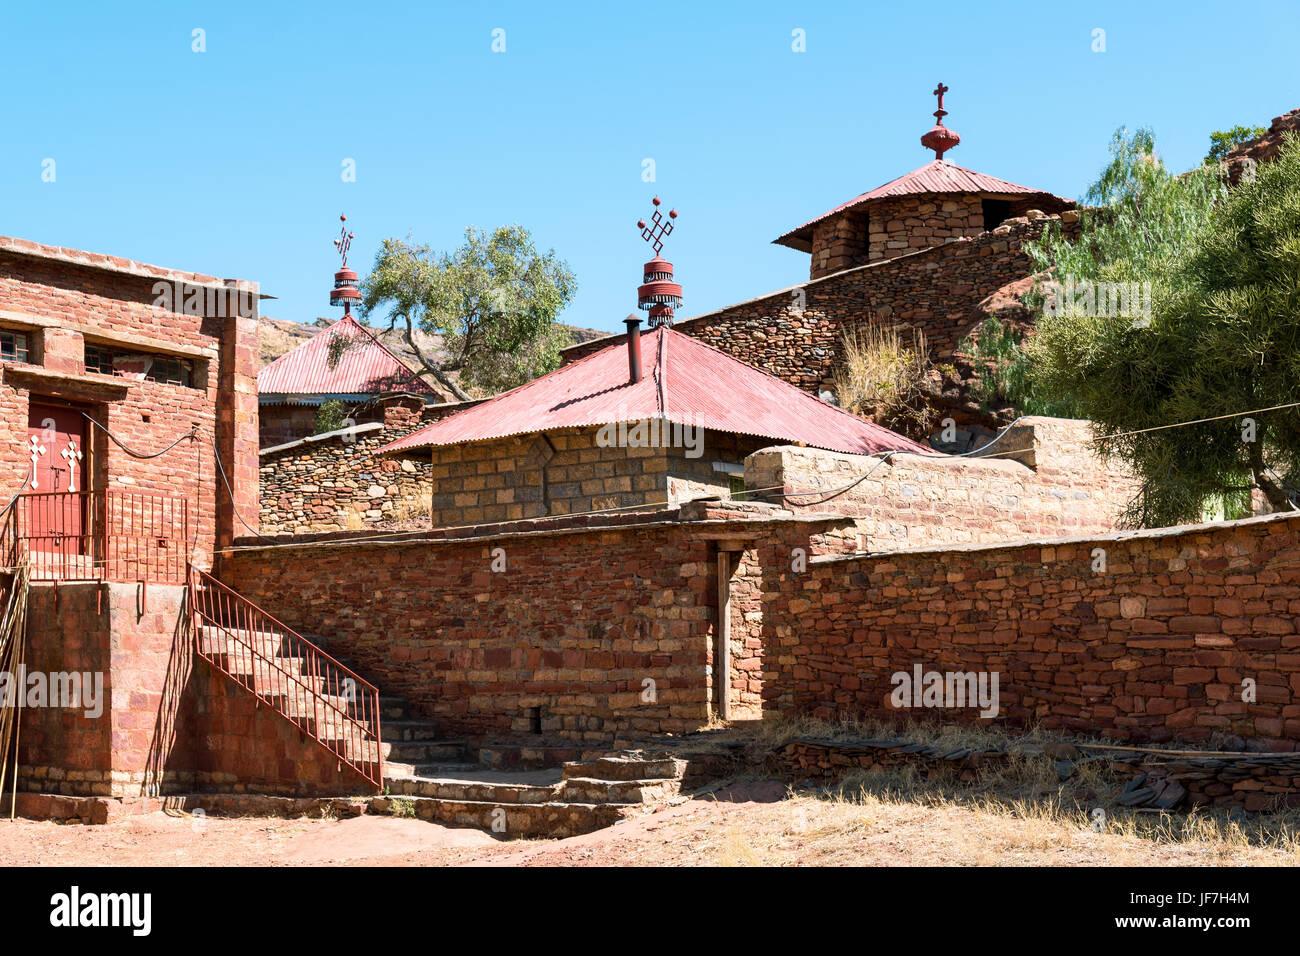 Ethiopia, Macalle, the old Abreha Atsbeha rock church - Stock Image